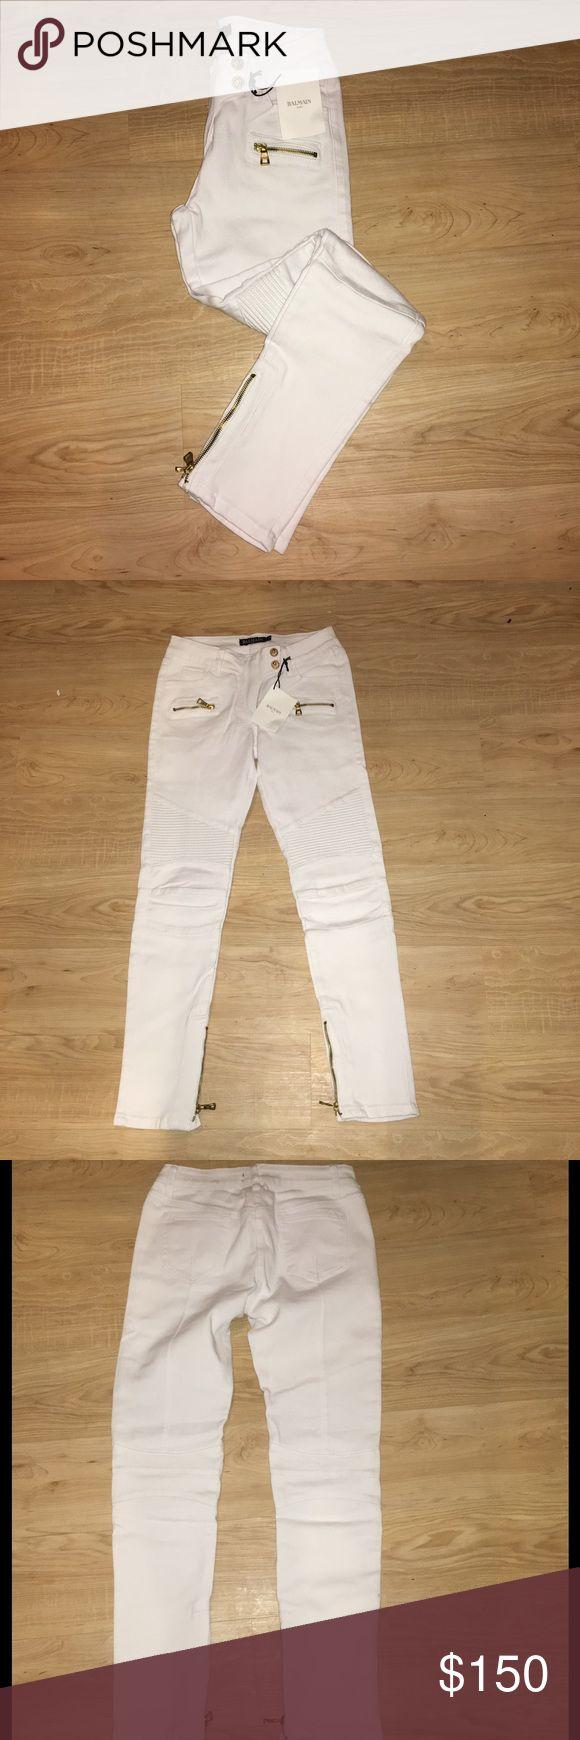 Balmain jean Size 30 never been used very stretchy Balmain Jeans Skinny